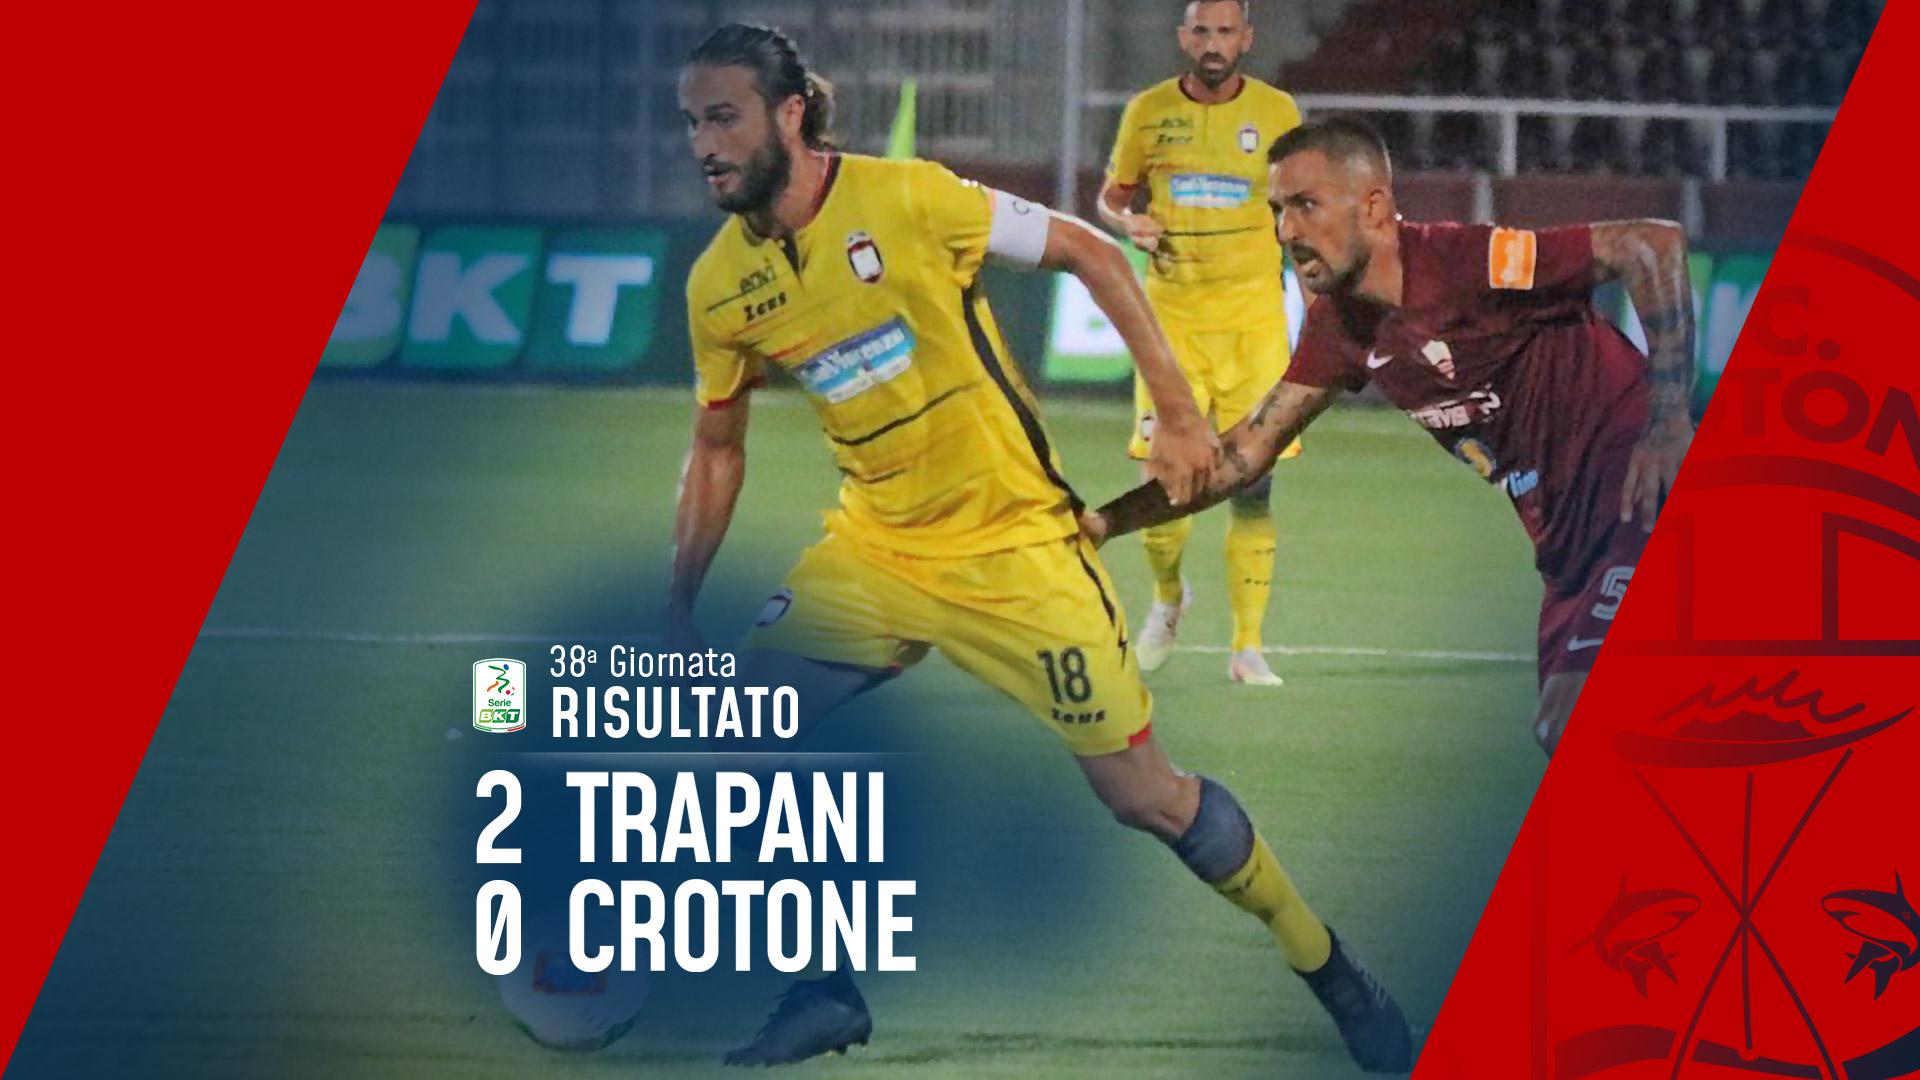 Serie BKT, 38a giornata: Trapani-Crotone 2-0